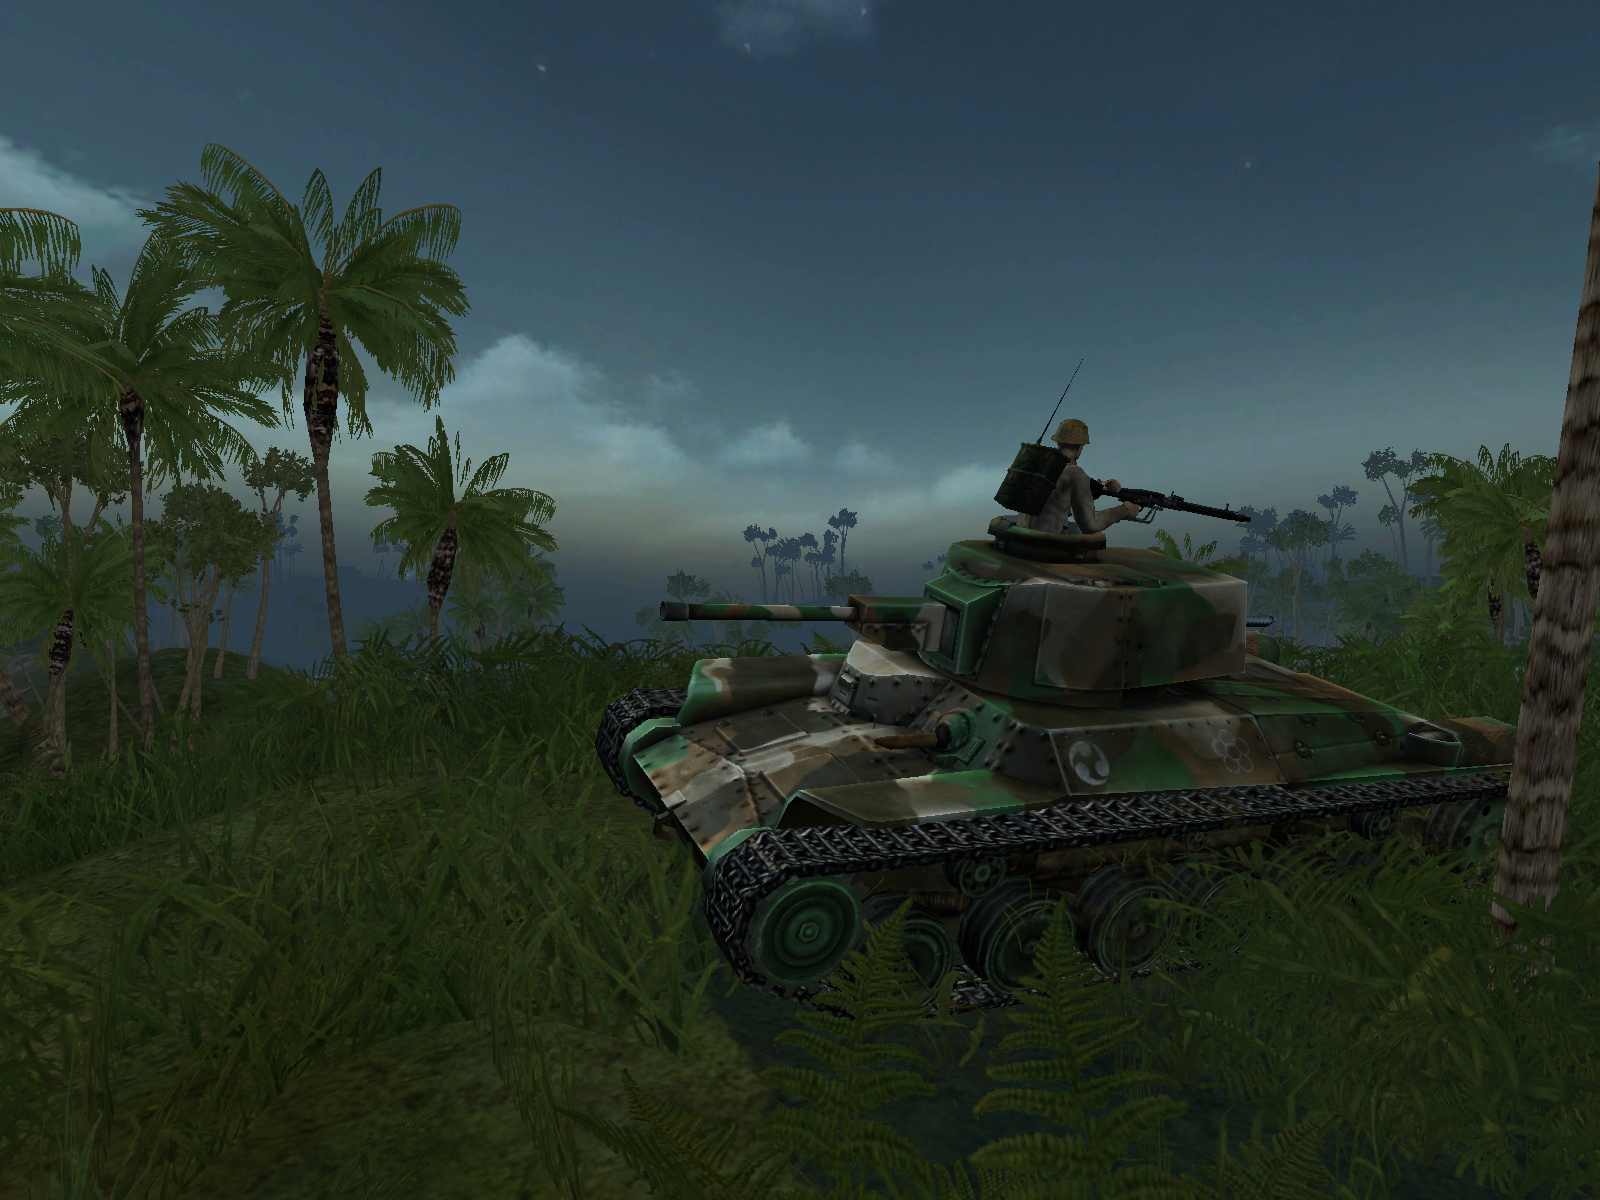 Bfv ww2 extended mod rc1 file battlefield vietnam mod db.